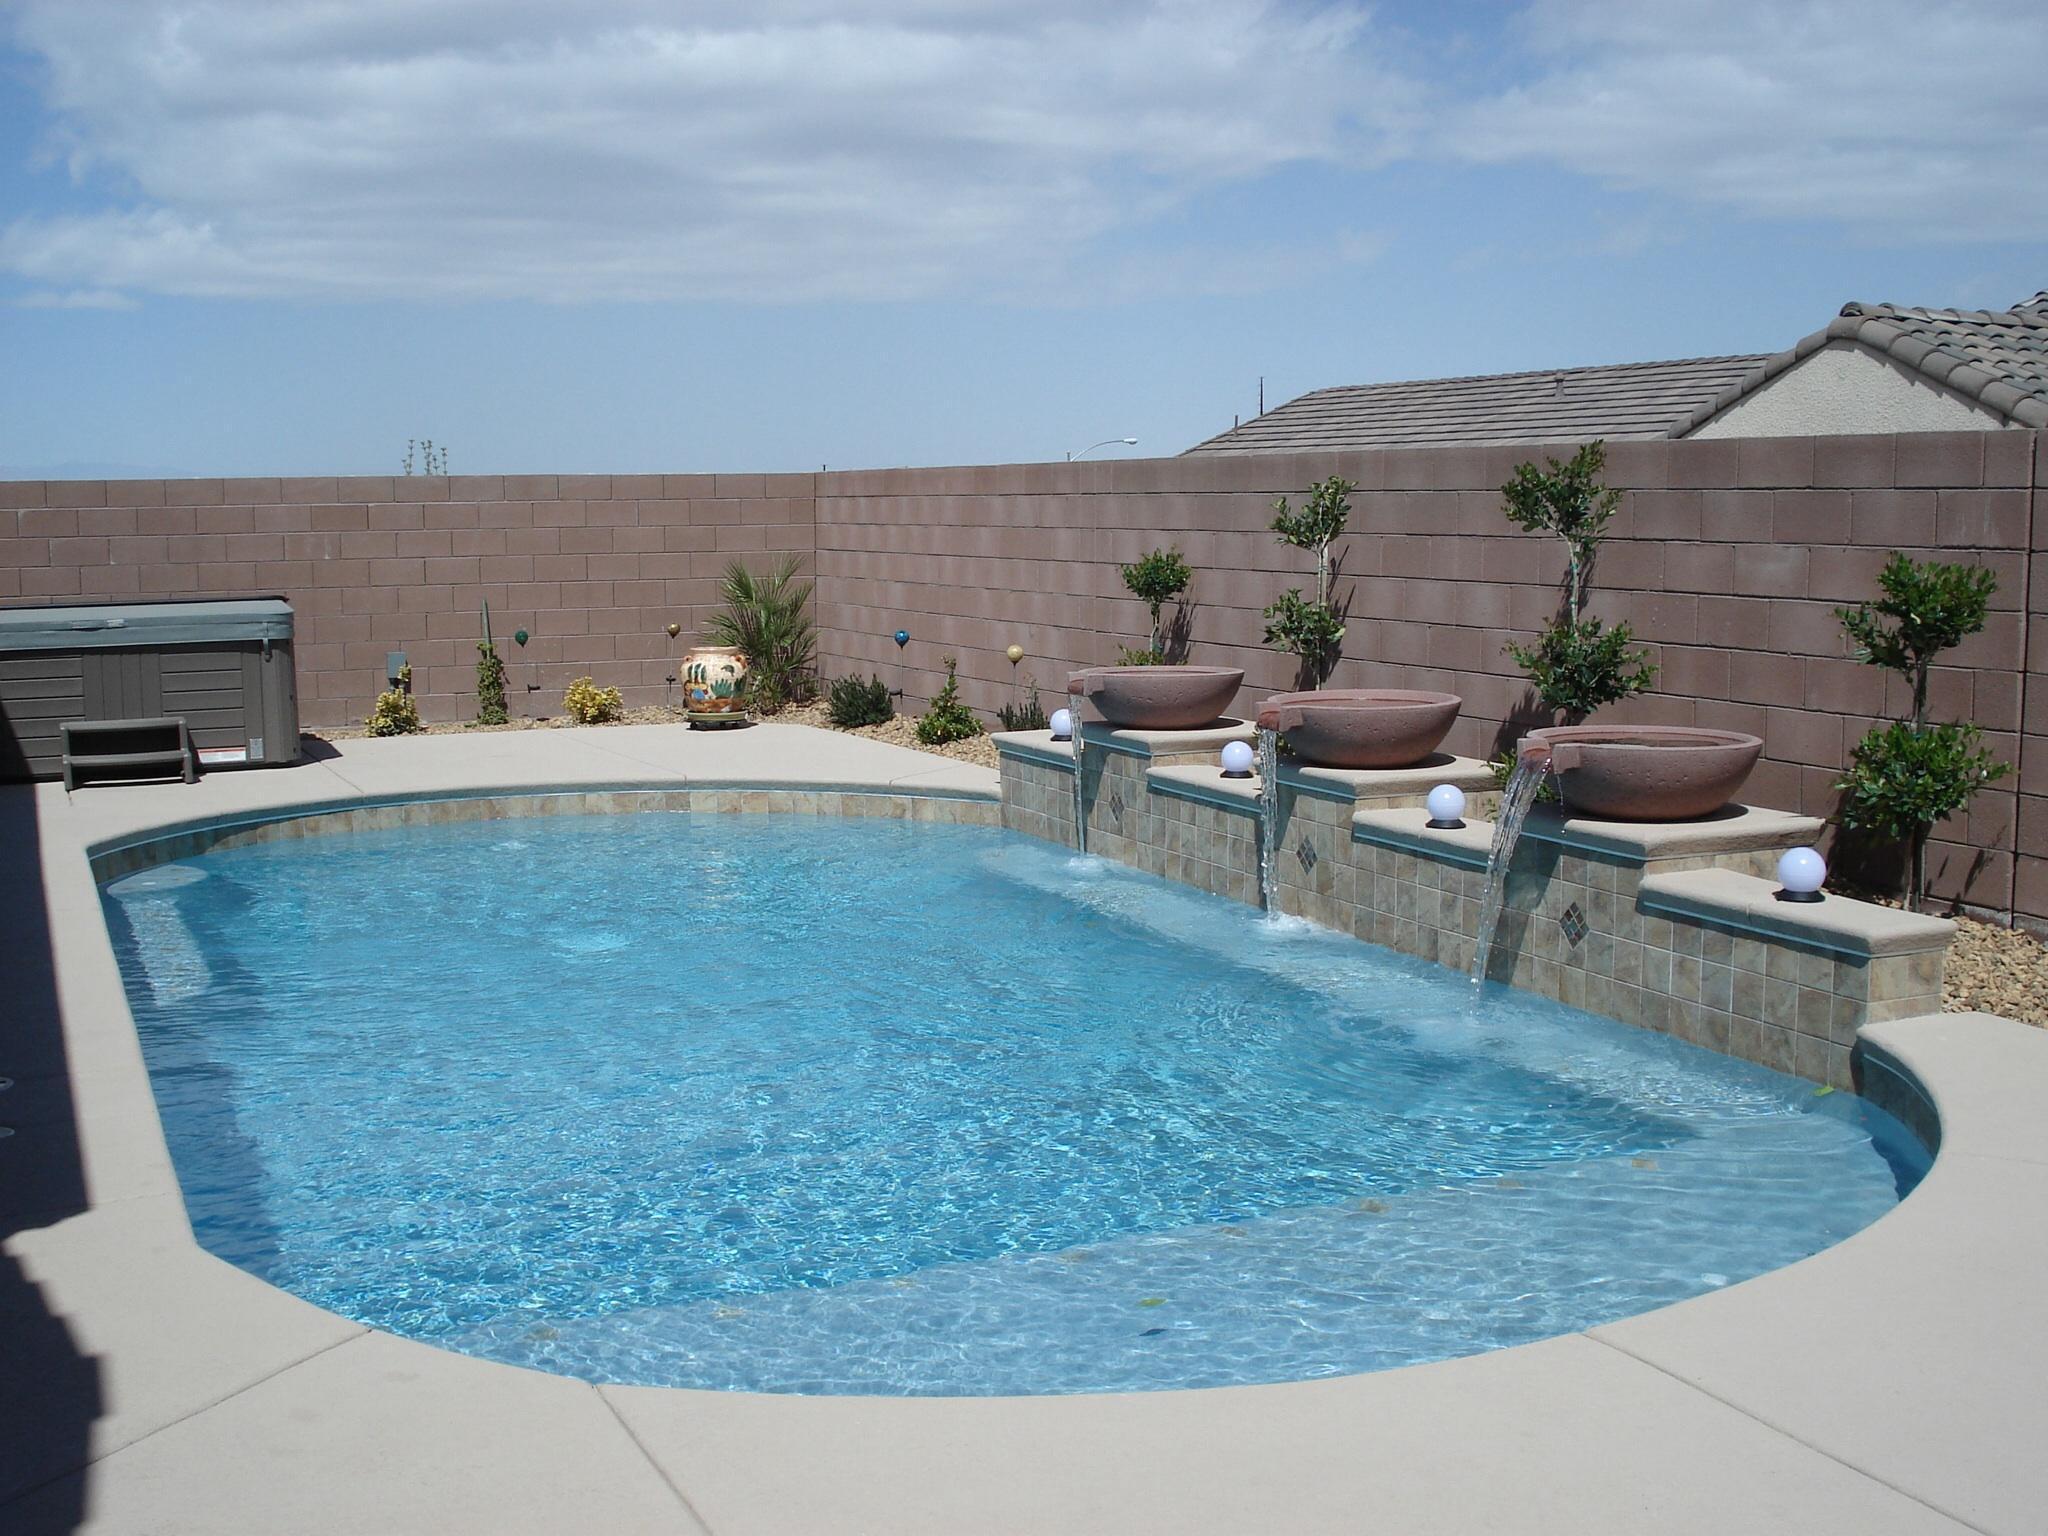 Mojave Blue Pools Design Llc In Las Vegas Nv 89108